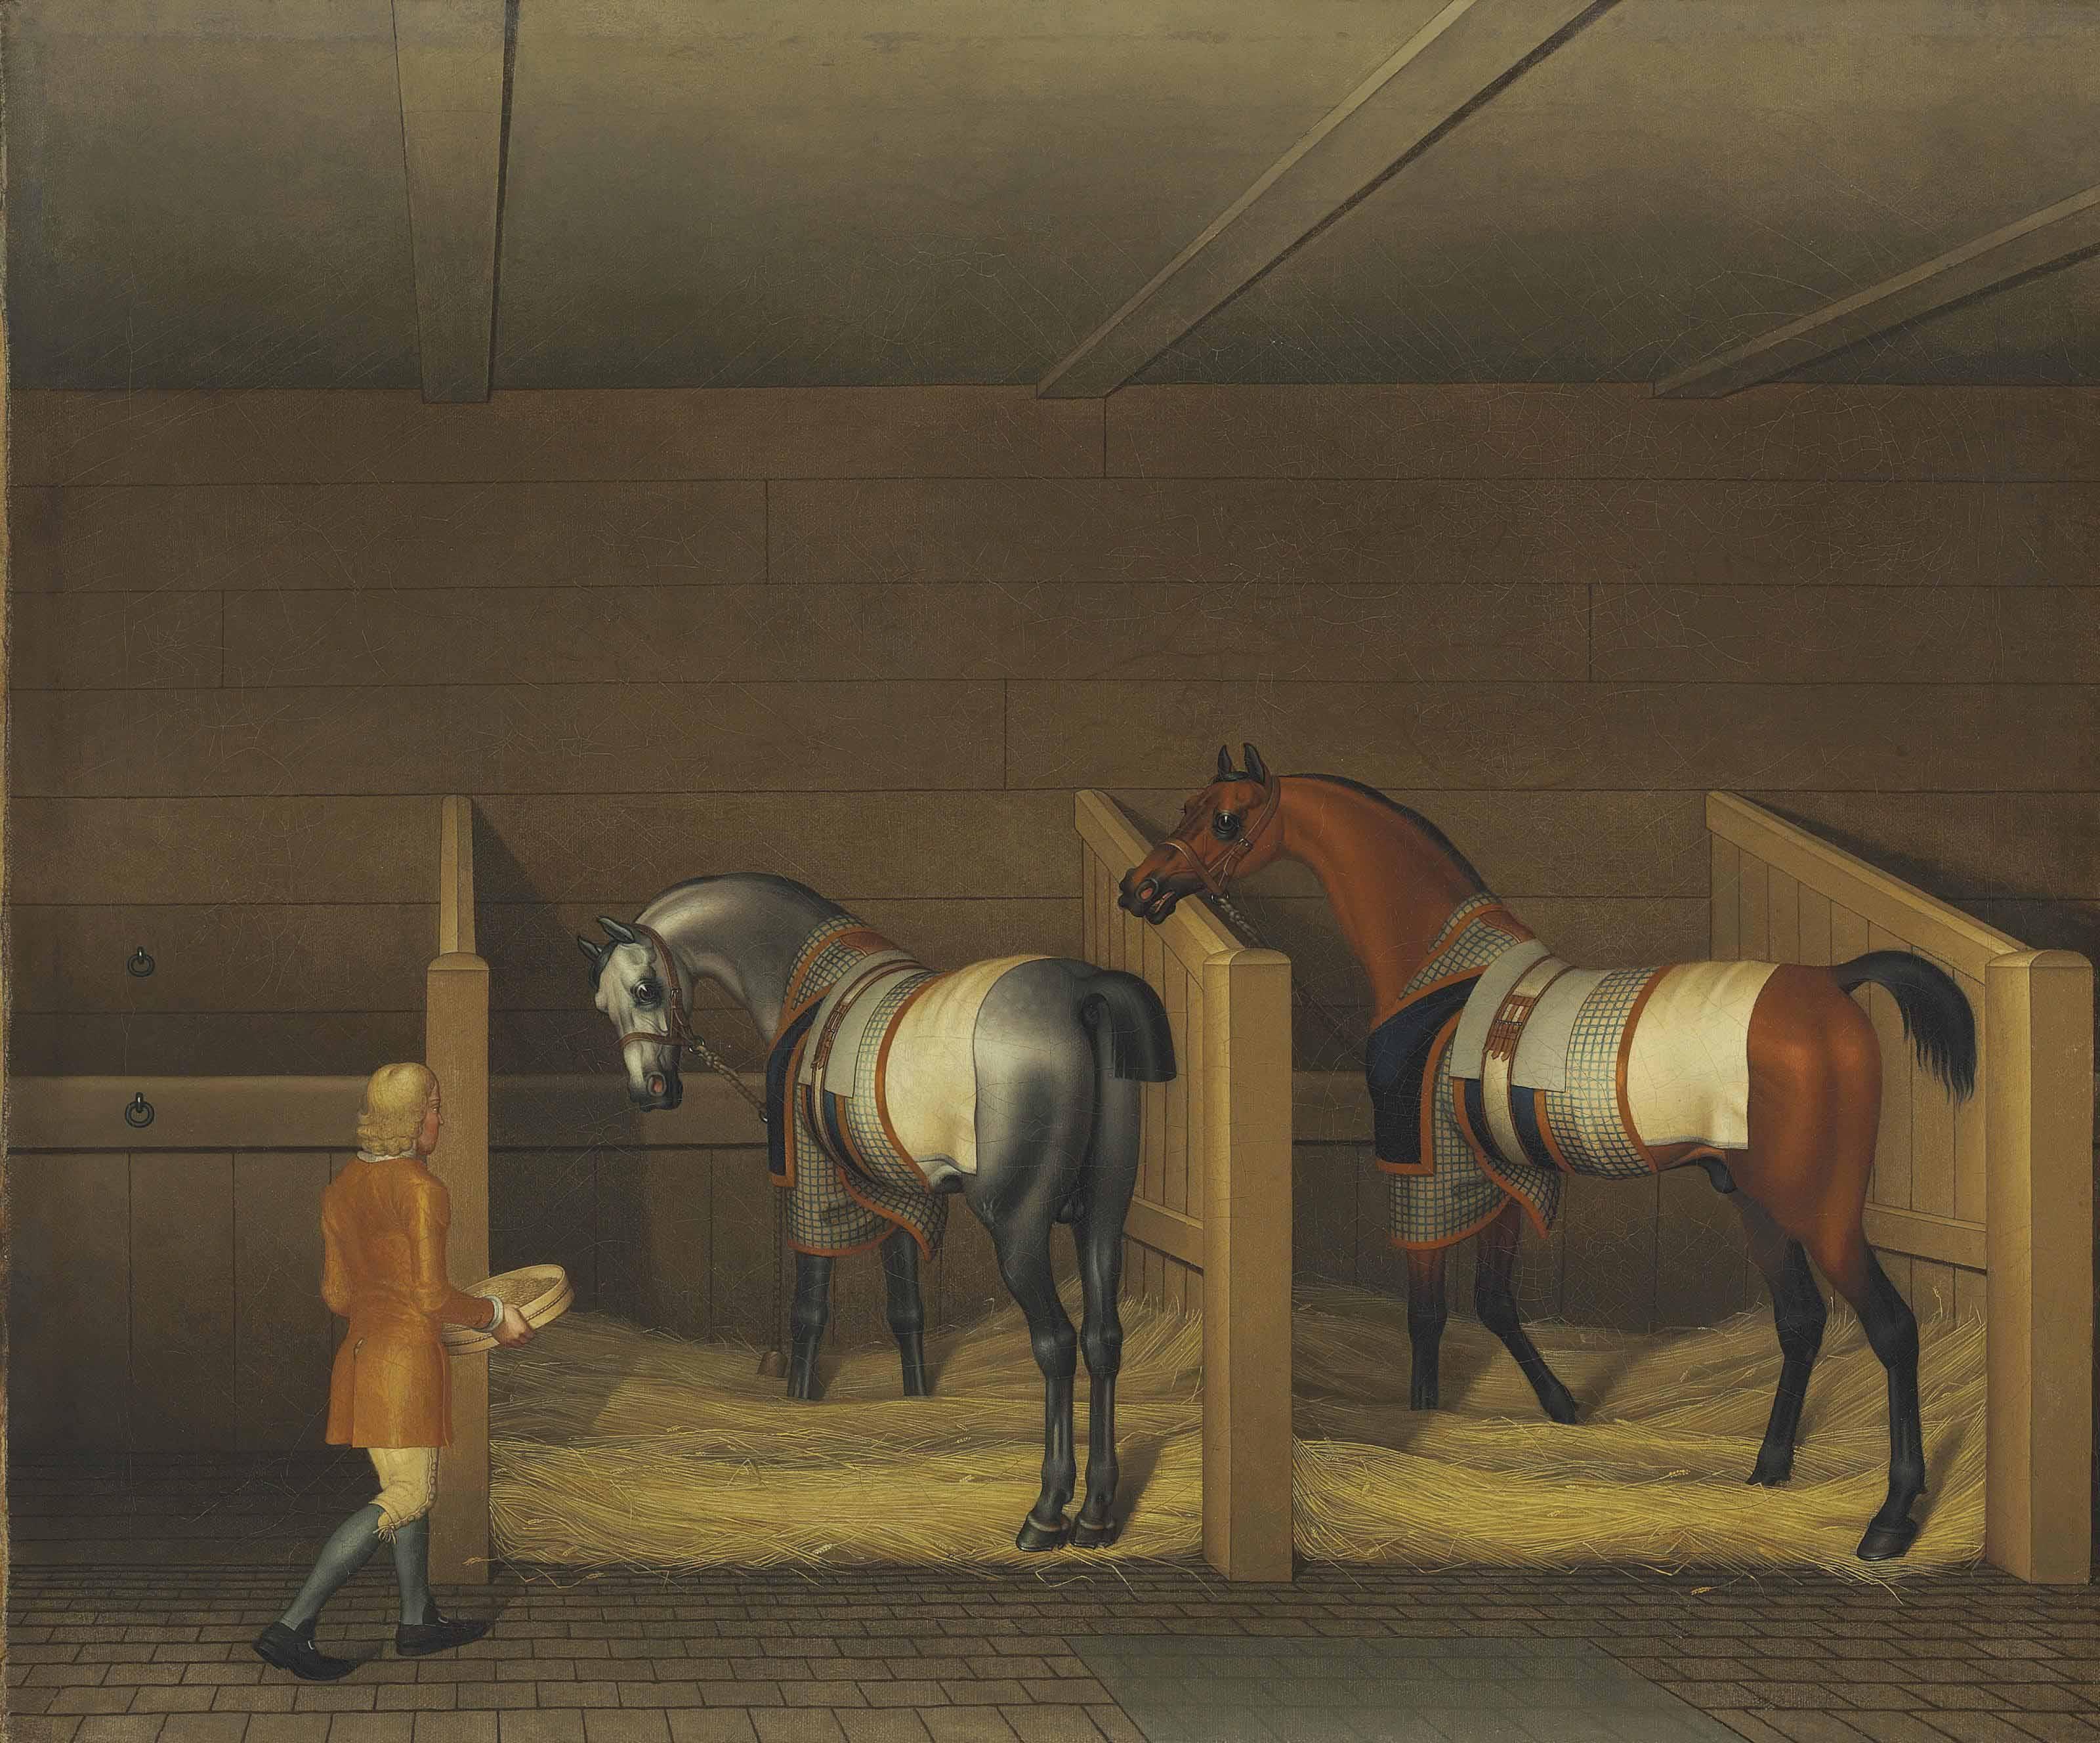 James Seymour (British, 1702-1